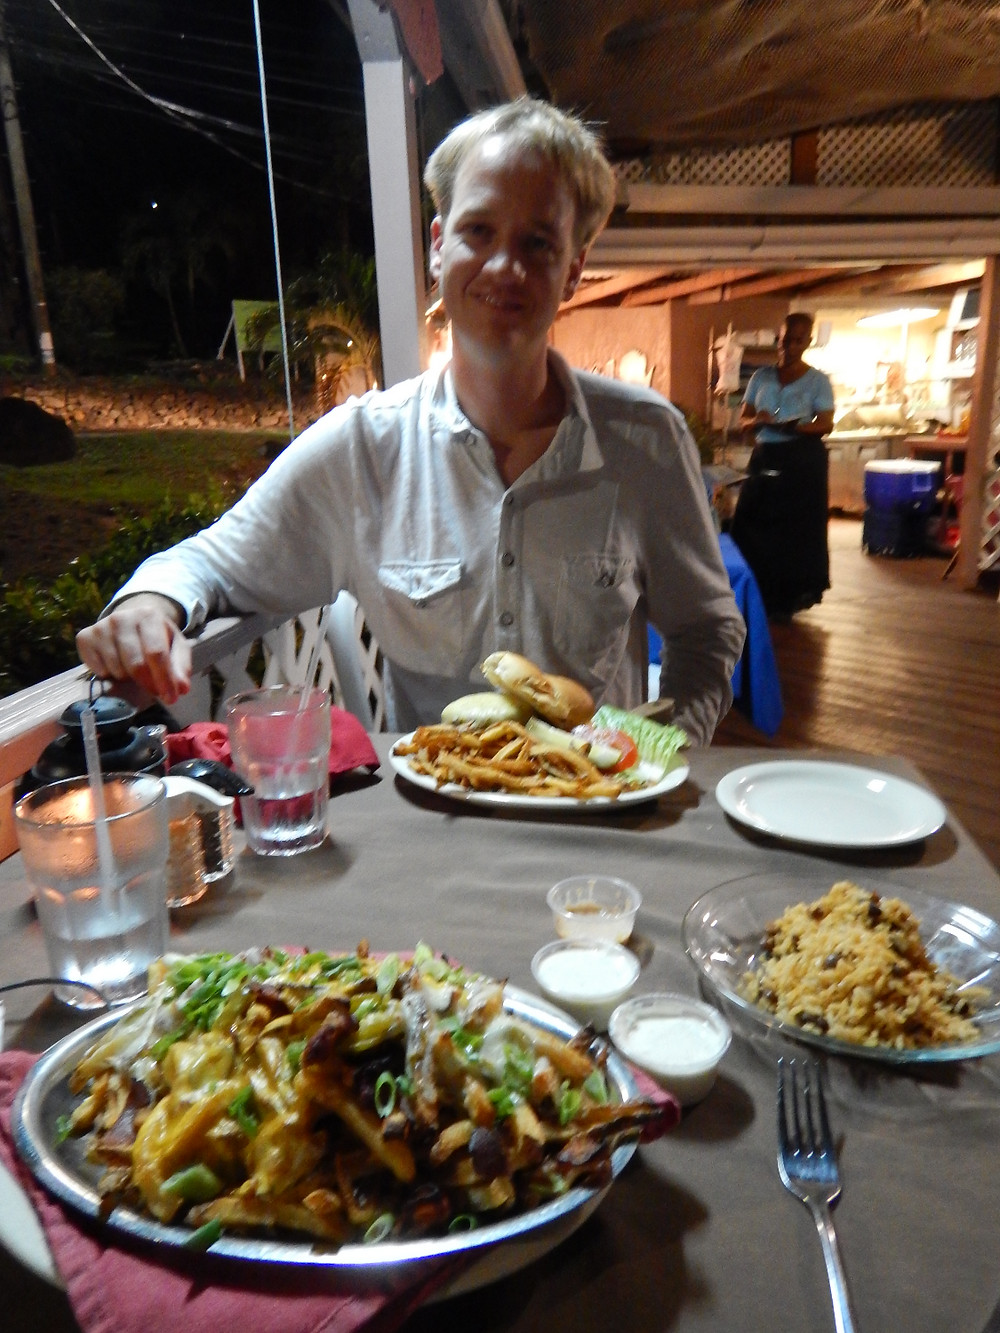 dining on appetizers on St. John, Caribbean. Vagabond style.